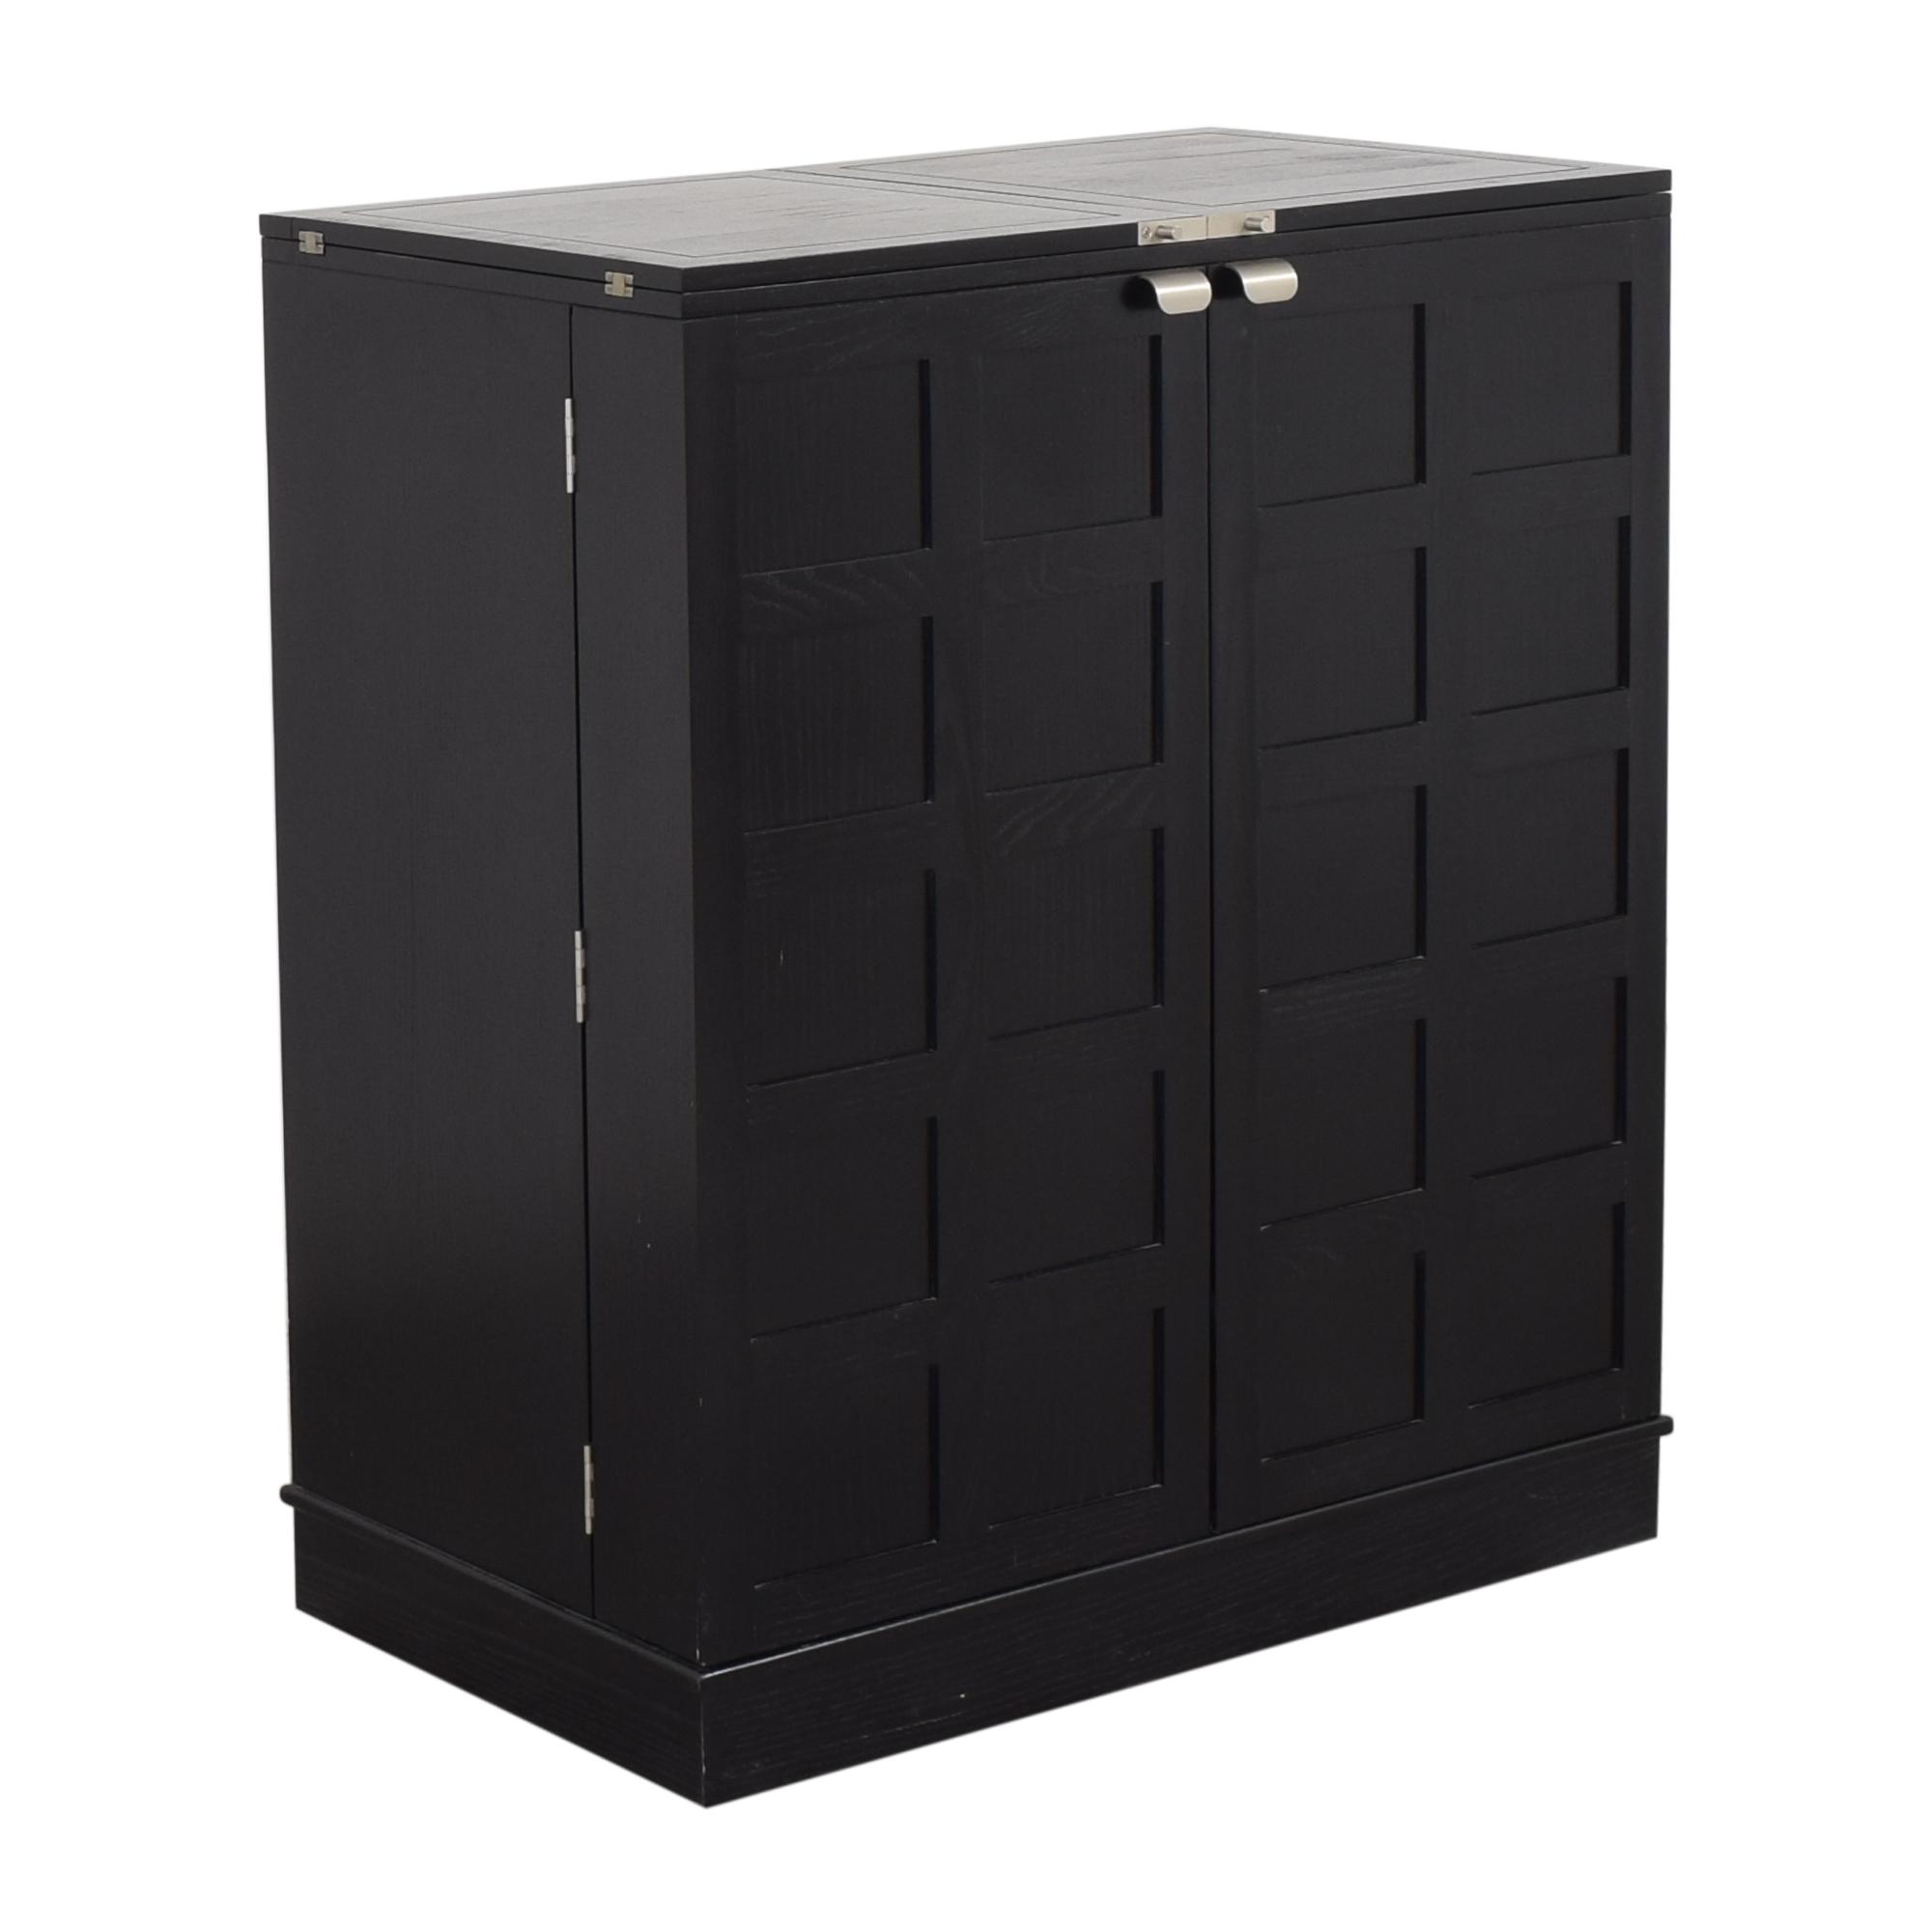 Crate & Barrel Crate & Barrel Steamer Bar Cabinet coupon